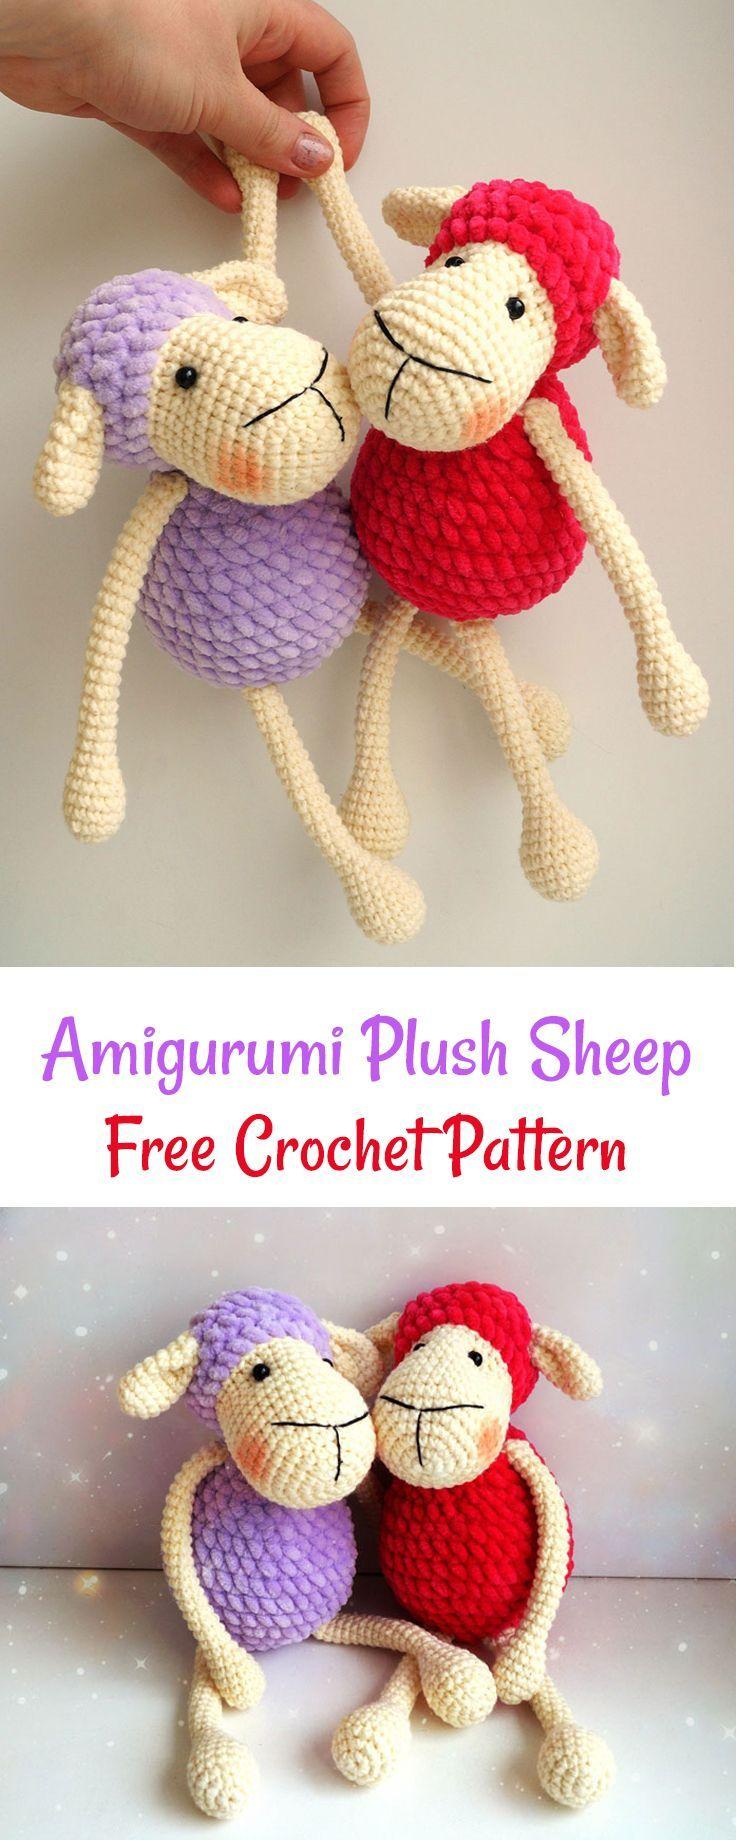 Amigurumi sheep plush toy pattern | Free crochet, Super easy and Crochet